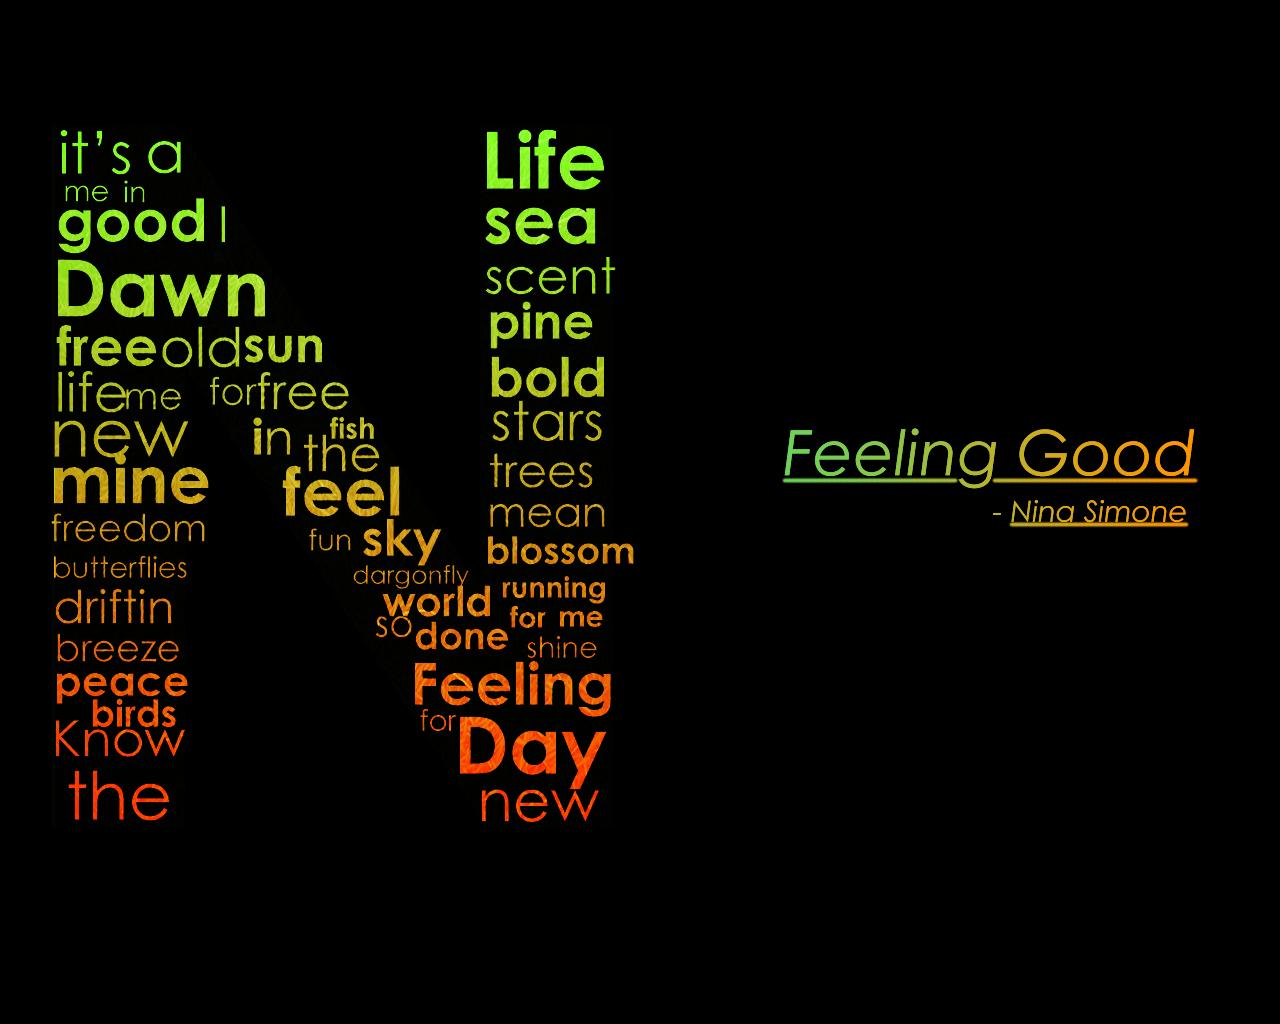 feeling good images - photo #9